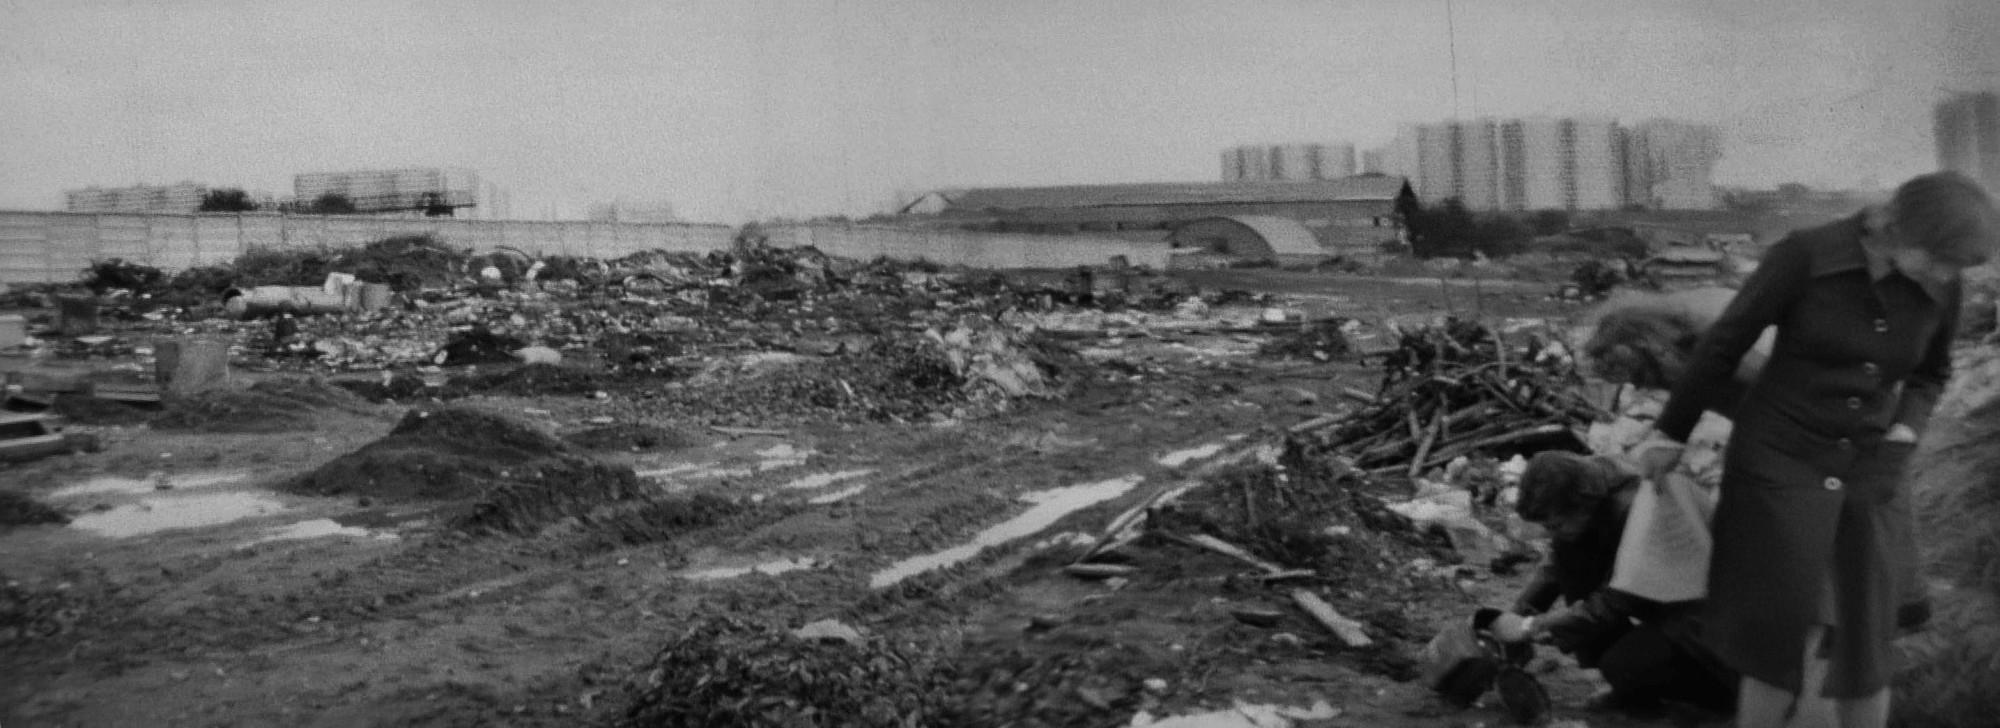 1984-85 Свалка на месте будущего микрорайона Никулино. Петр Рудов